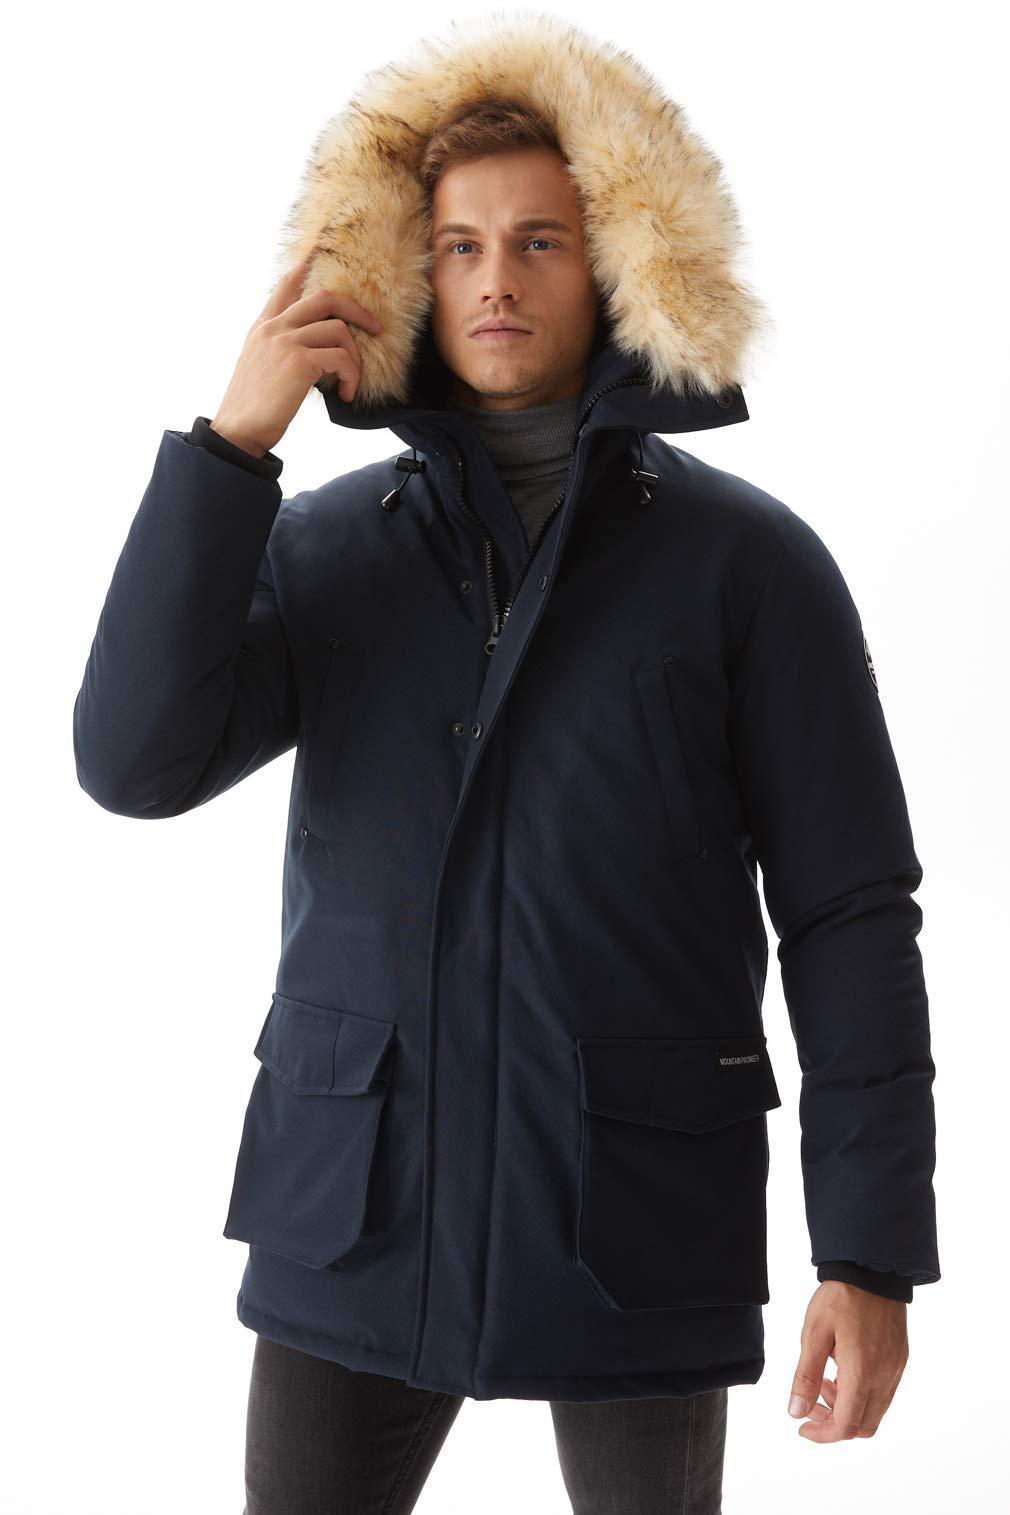 Molemsx Mens Fur Parka, Faux Fur Classy Lined Warm Overcoat Outdoor Down Alternative Sports Ski Camping Expedition Insulated Mountain Ski Jacket Navy Medium by Molemsx